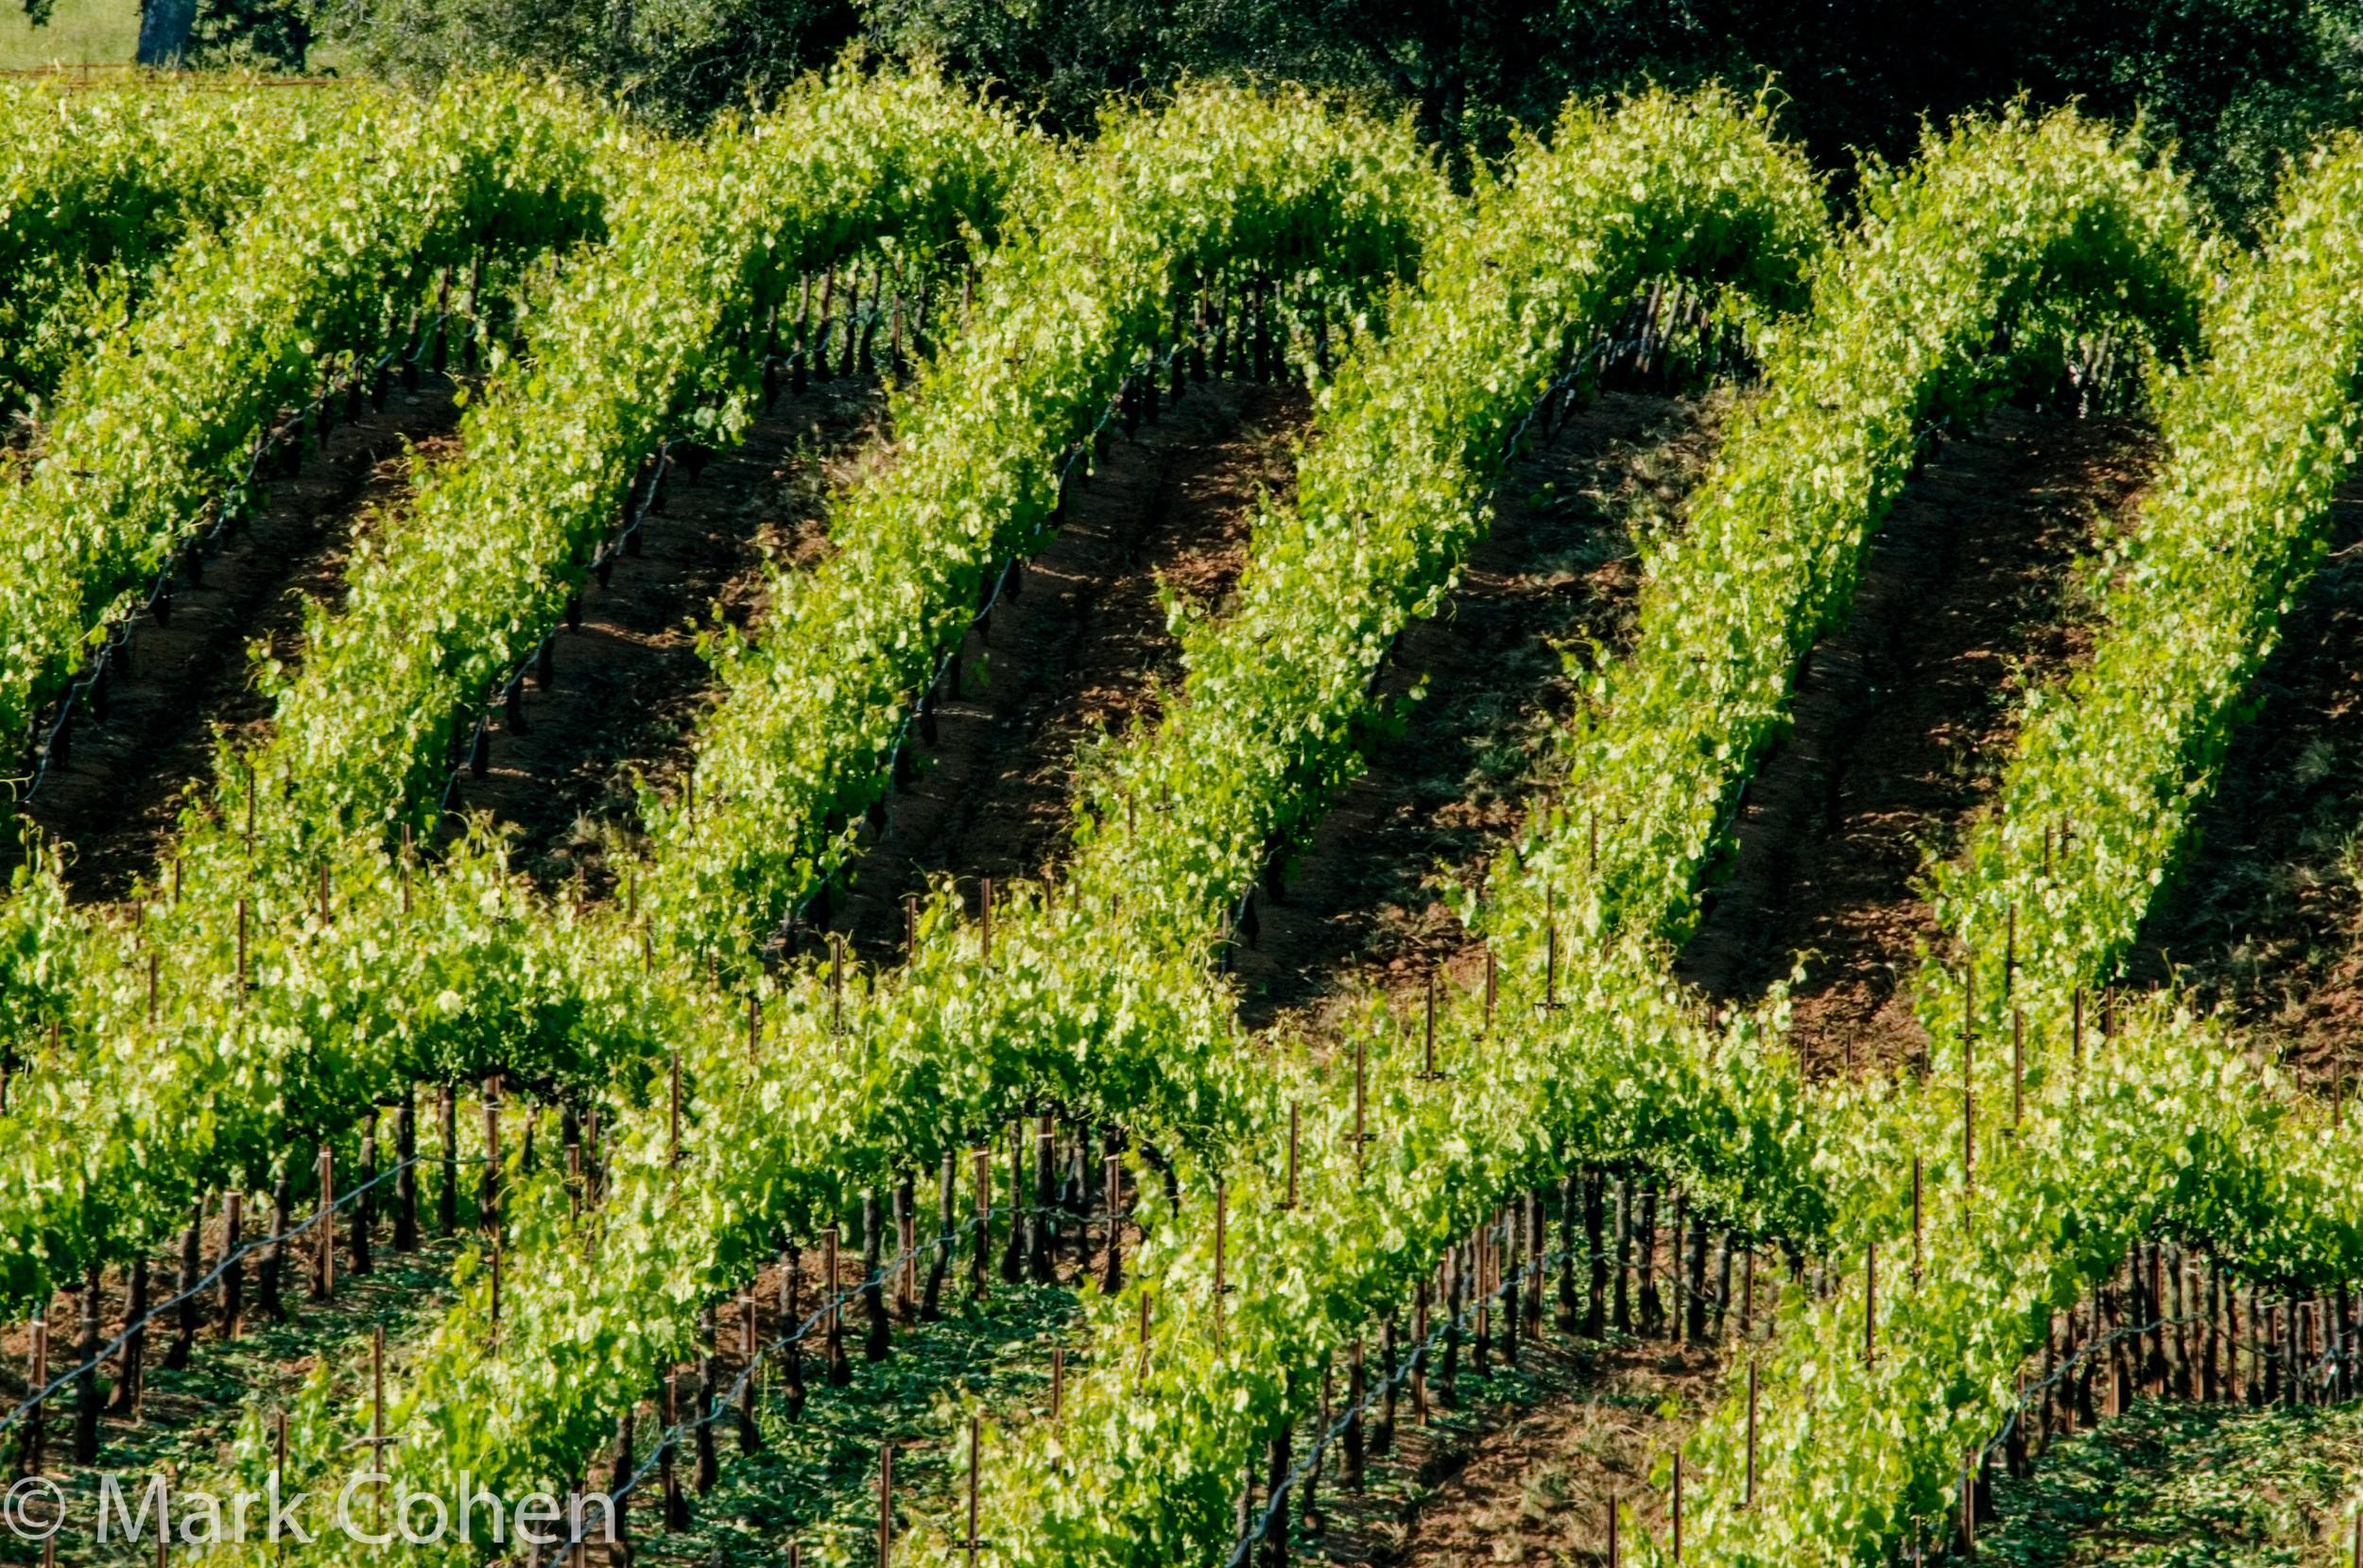 Vineyard no.6, San Joaquin County, 2006